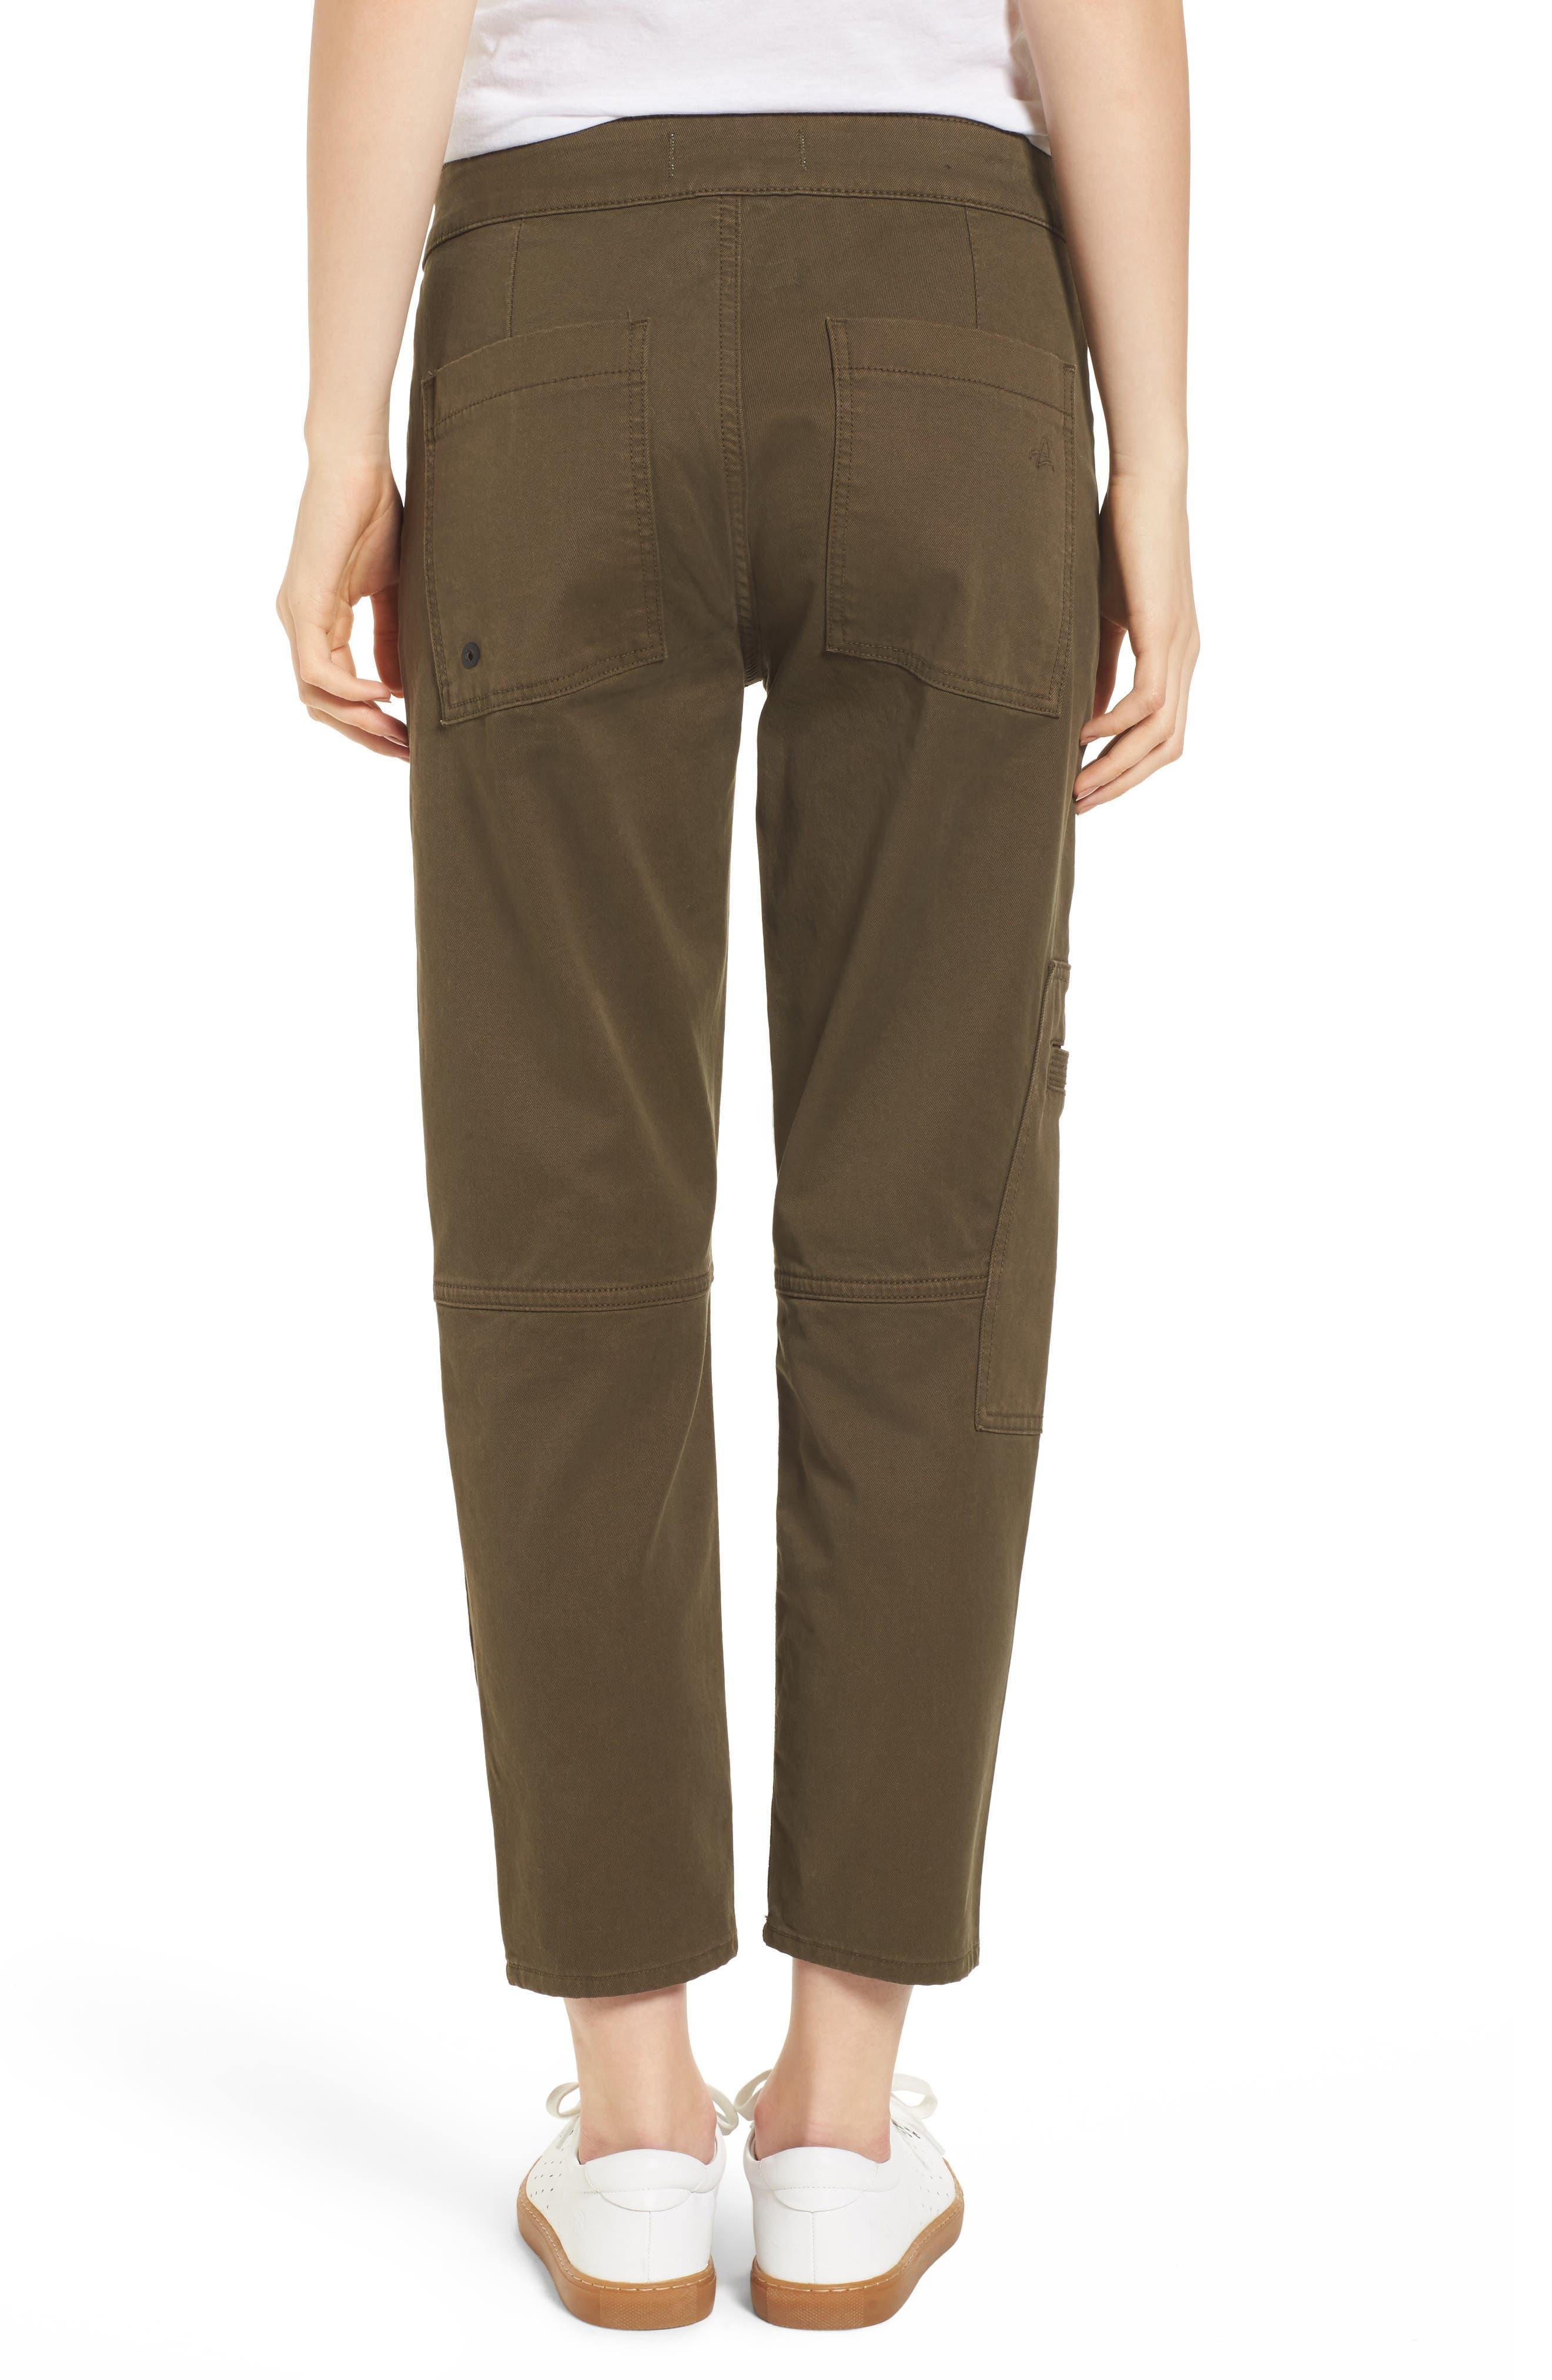 Elliot Slouchy Slim Cargo Pants,                             Alternate thumbnail 2, color,                             205